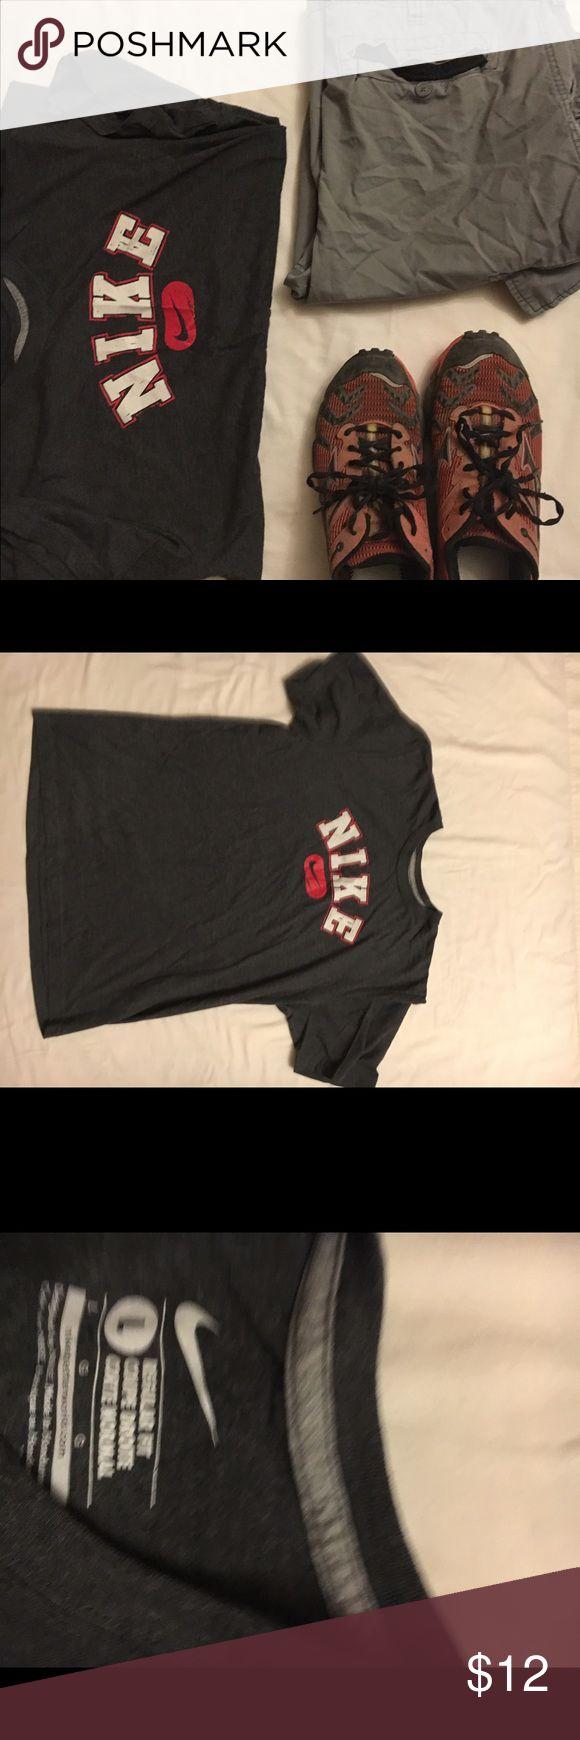 Black keys t shirt uk - Nike T Shirt